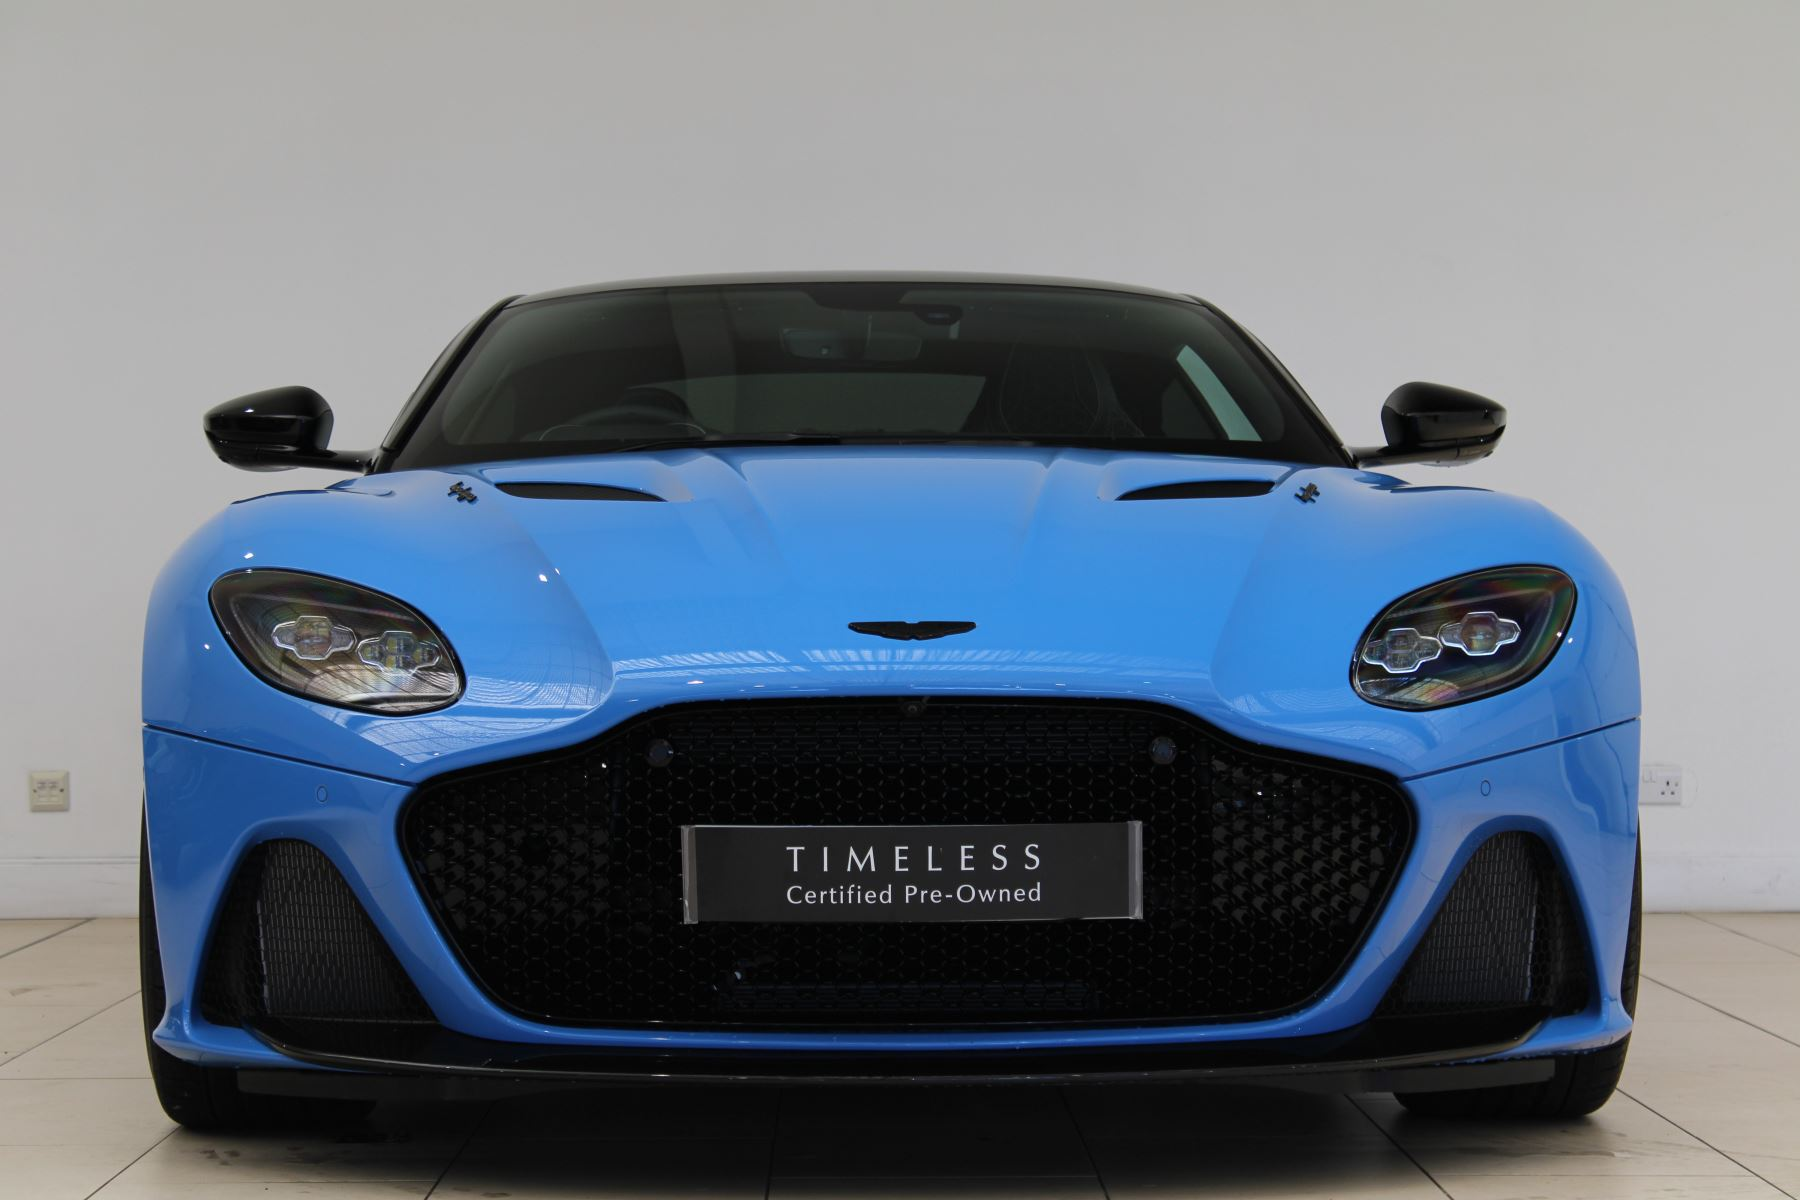 Aston Martin DBS V12 Superleggera Touchtronic Special Ceramic Blue - B&O image 3